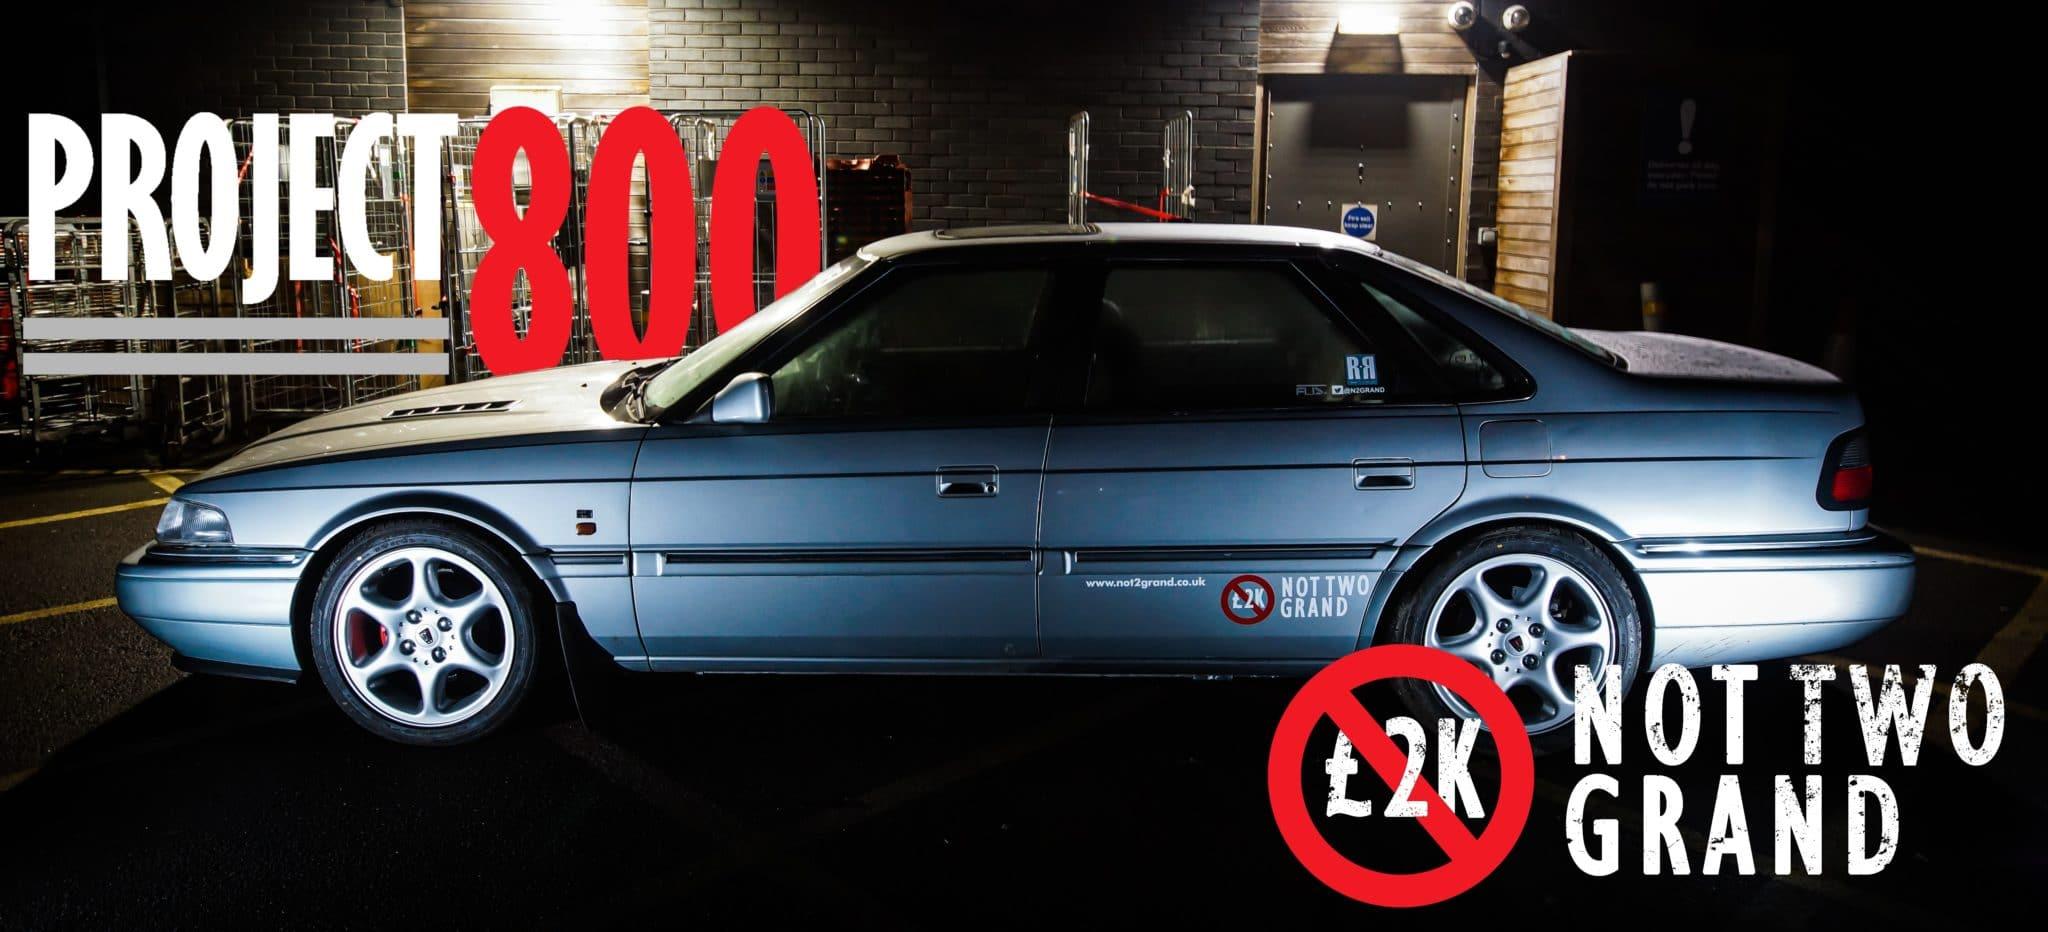 Project 800, Rover 800, Rover Vitesse, Rover 820, Rover Vitesse Sport, classic car, retro car, motoring, automotive, project car, restoration project, car and classic, not2grand, turbo, modified car, modified Rover, featured, car, cars, retro,